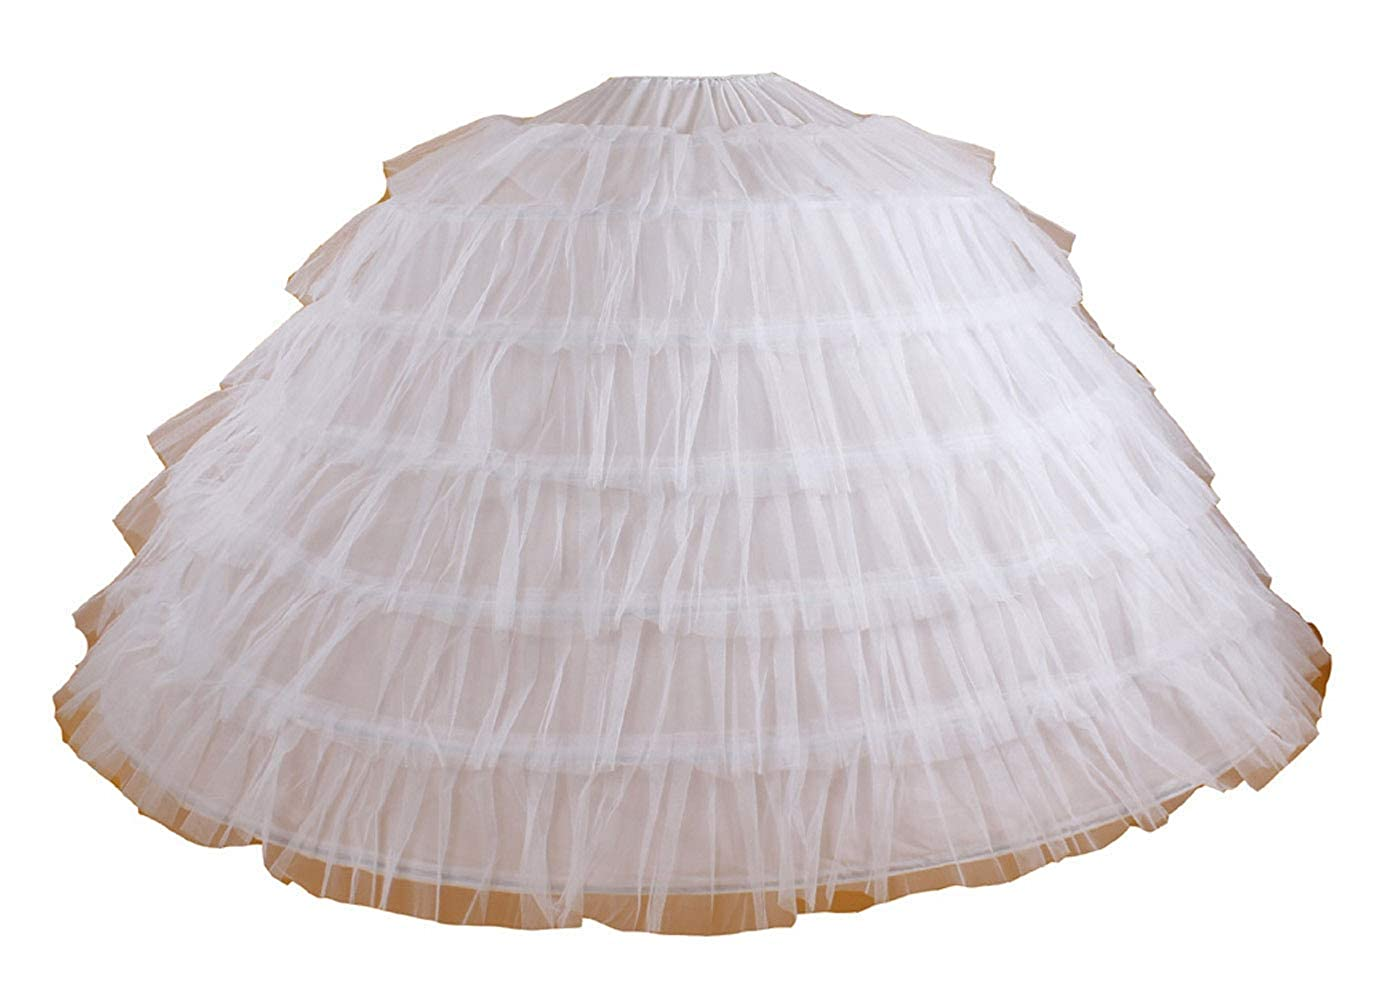 64efbc82ef997 White Super Big 7-hoop Wedding Bridal Prom Petticoat Underskirt Crinoline